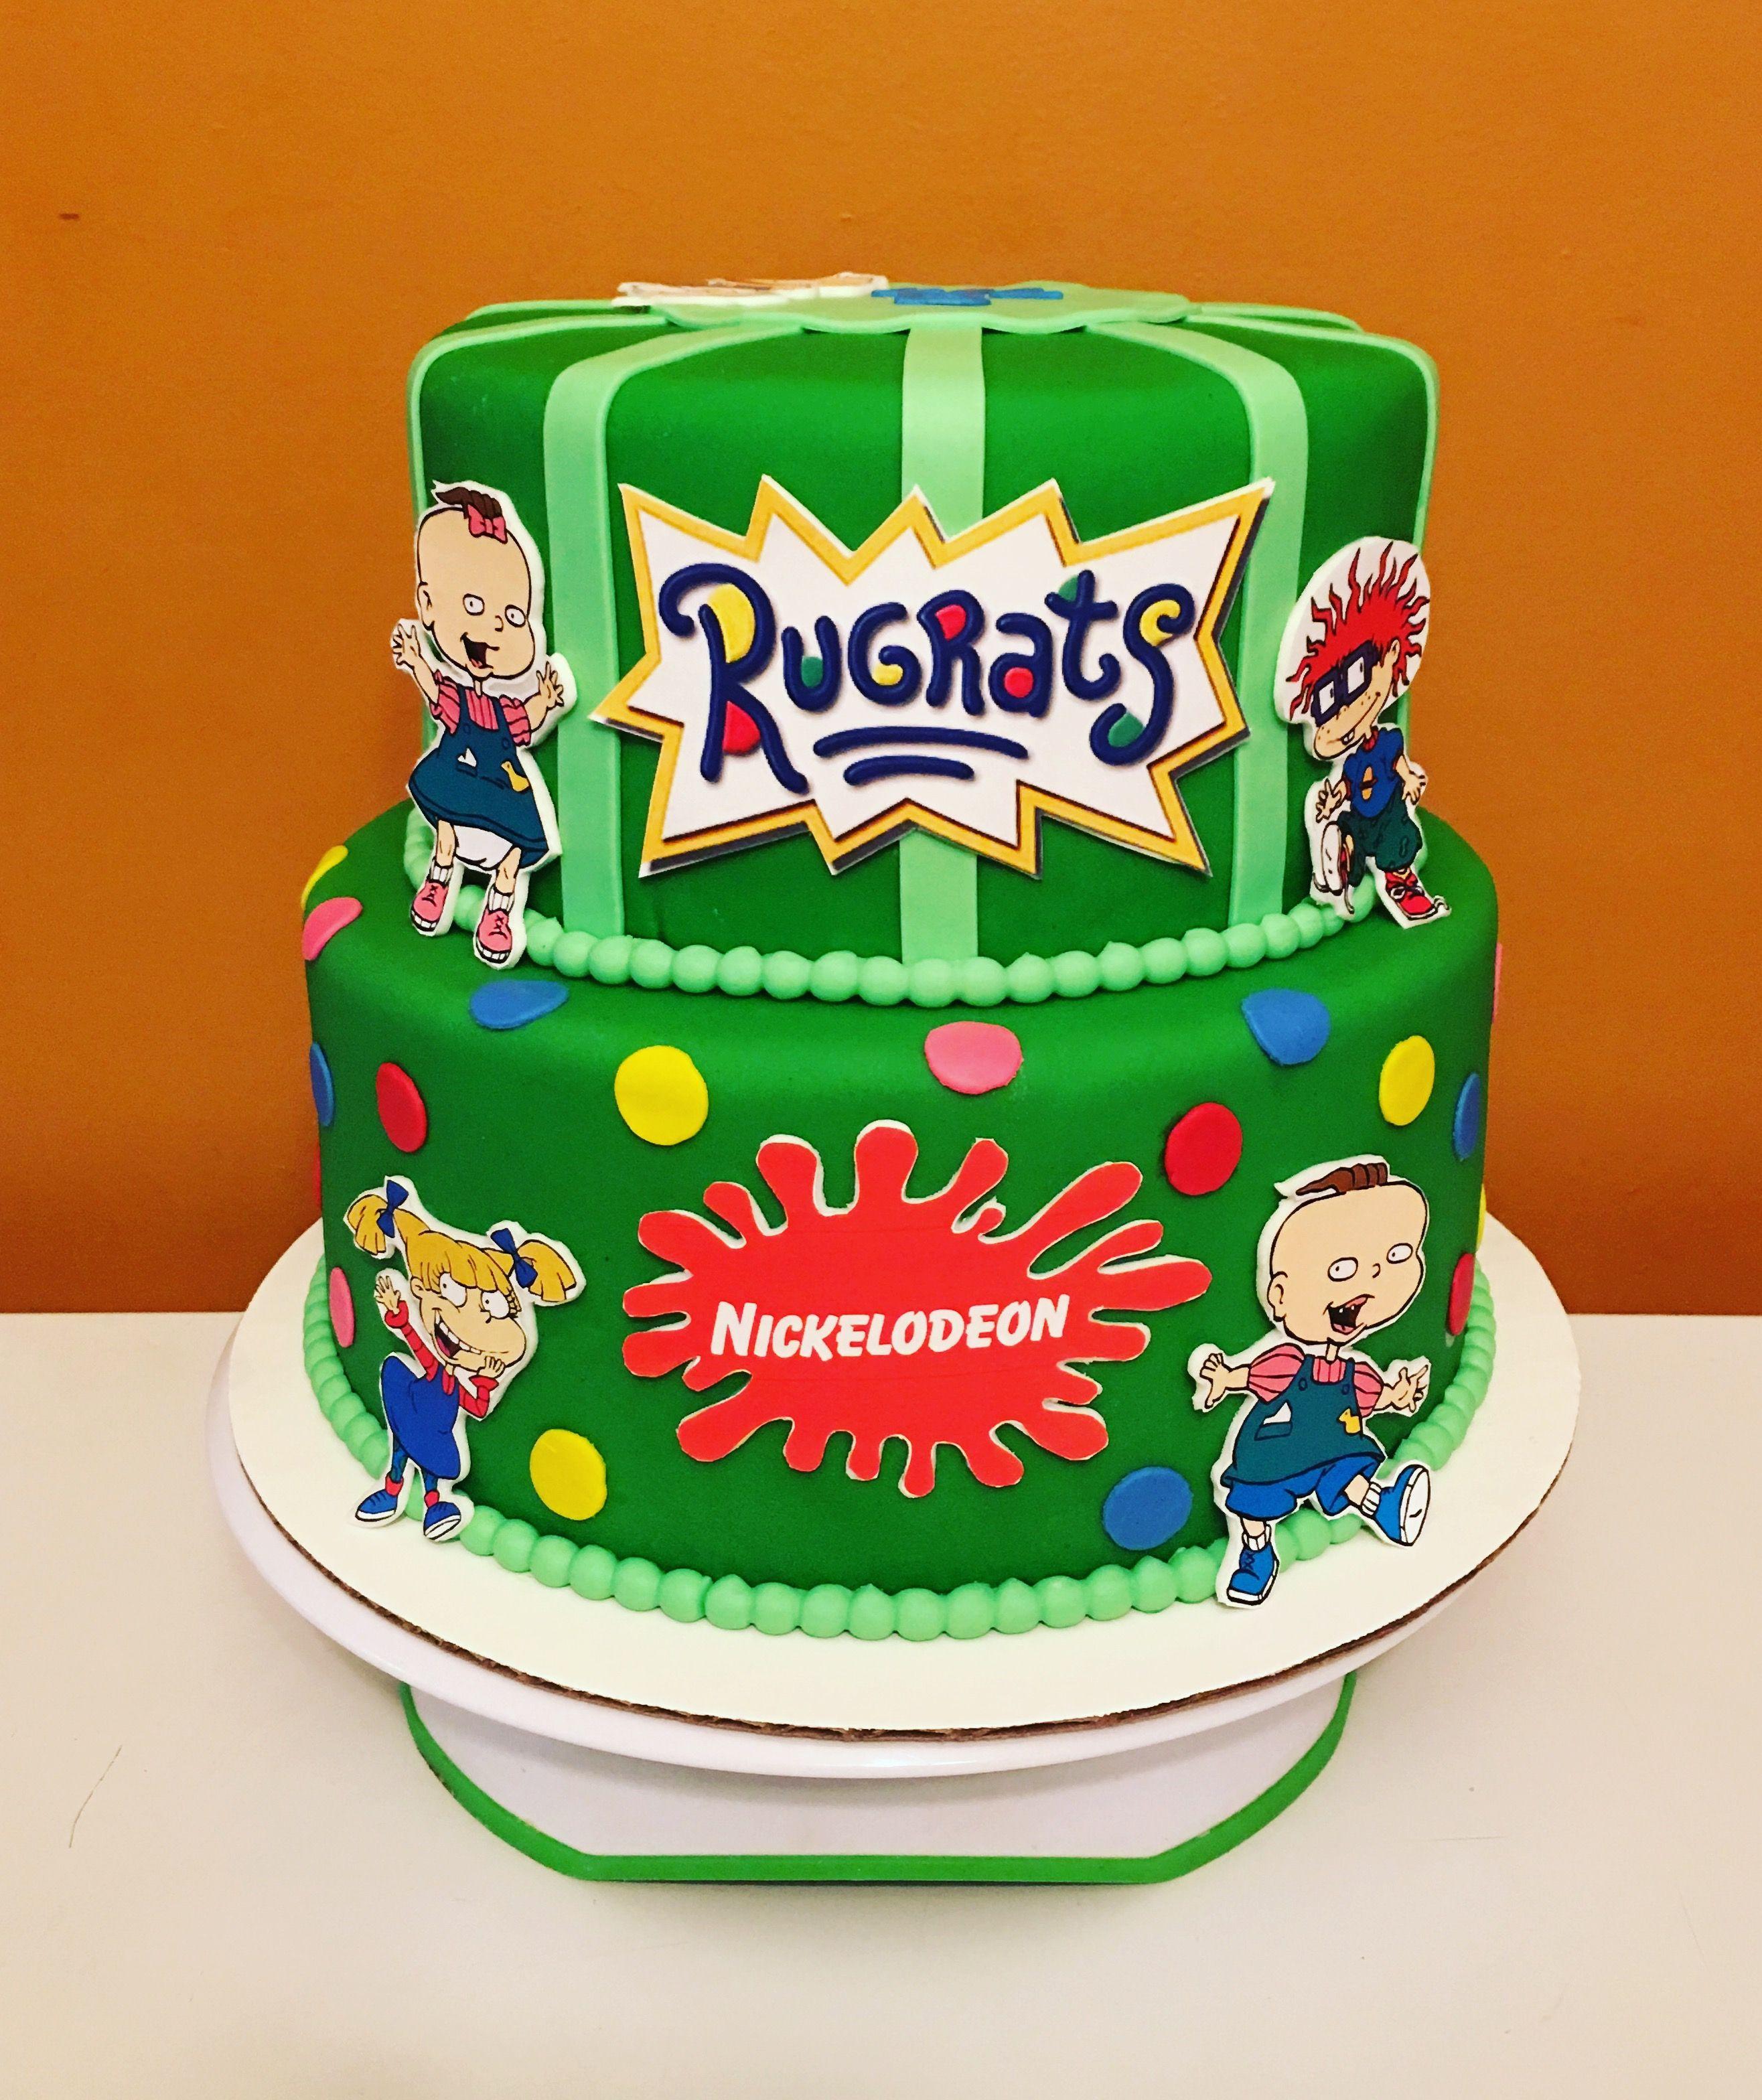 Pleasing Rugrats Cake Rugarts In 2019 Cake Rugrats Birthday Cake Funny Birthday Cards Online Necthendildamsfinfo